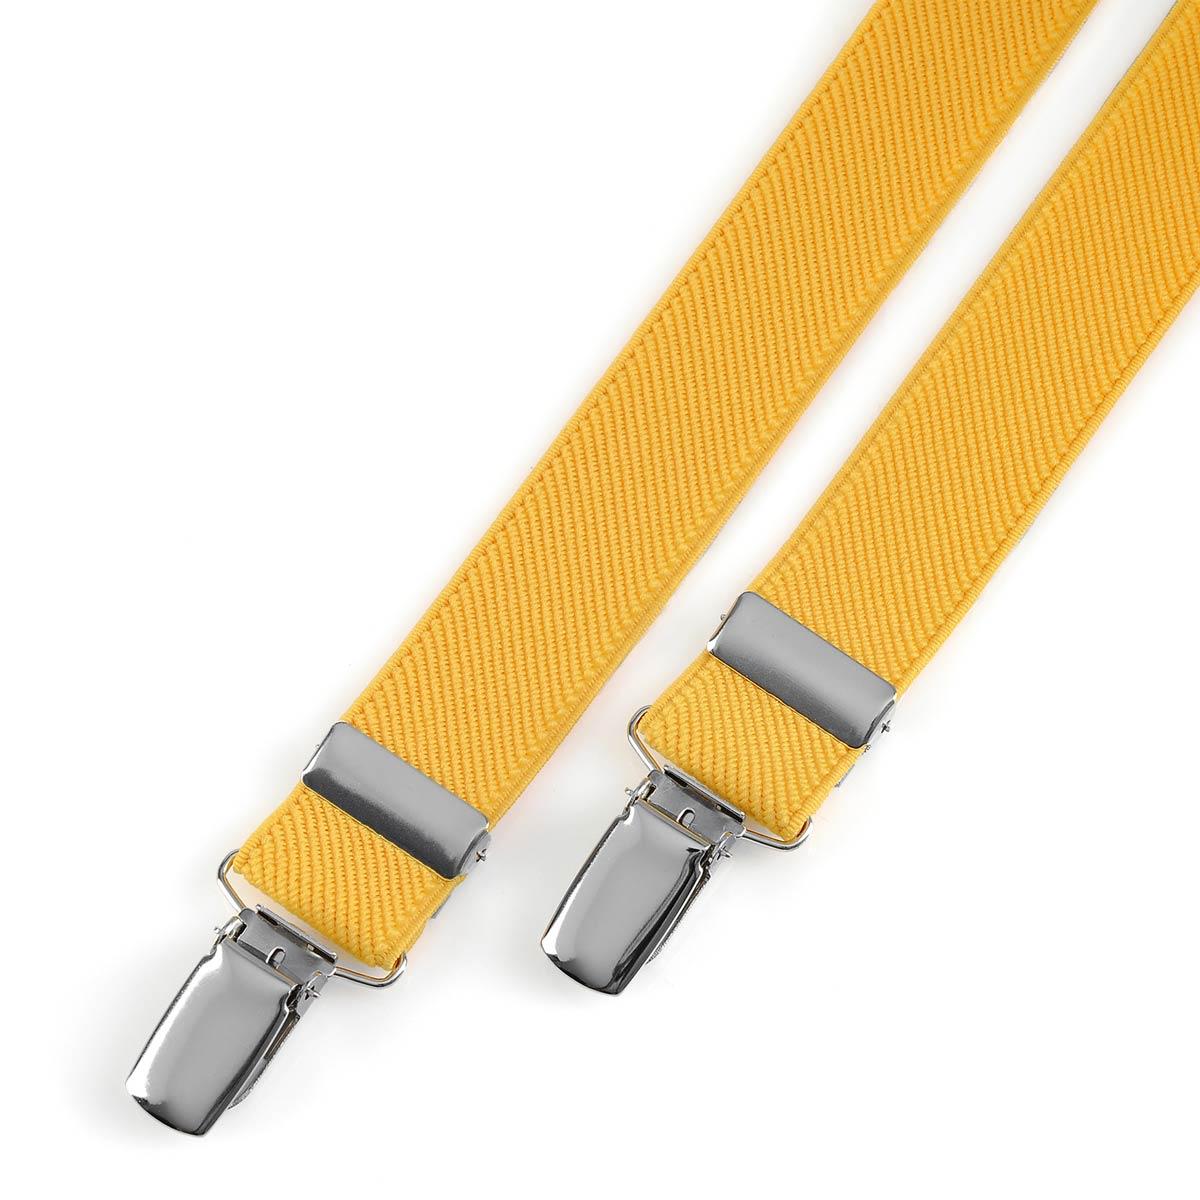 BT-00366_A12-1--_Bretelles-fines-jaune-imperial